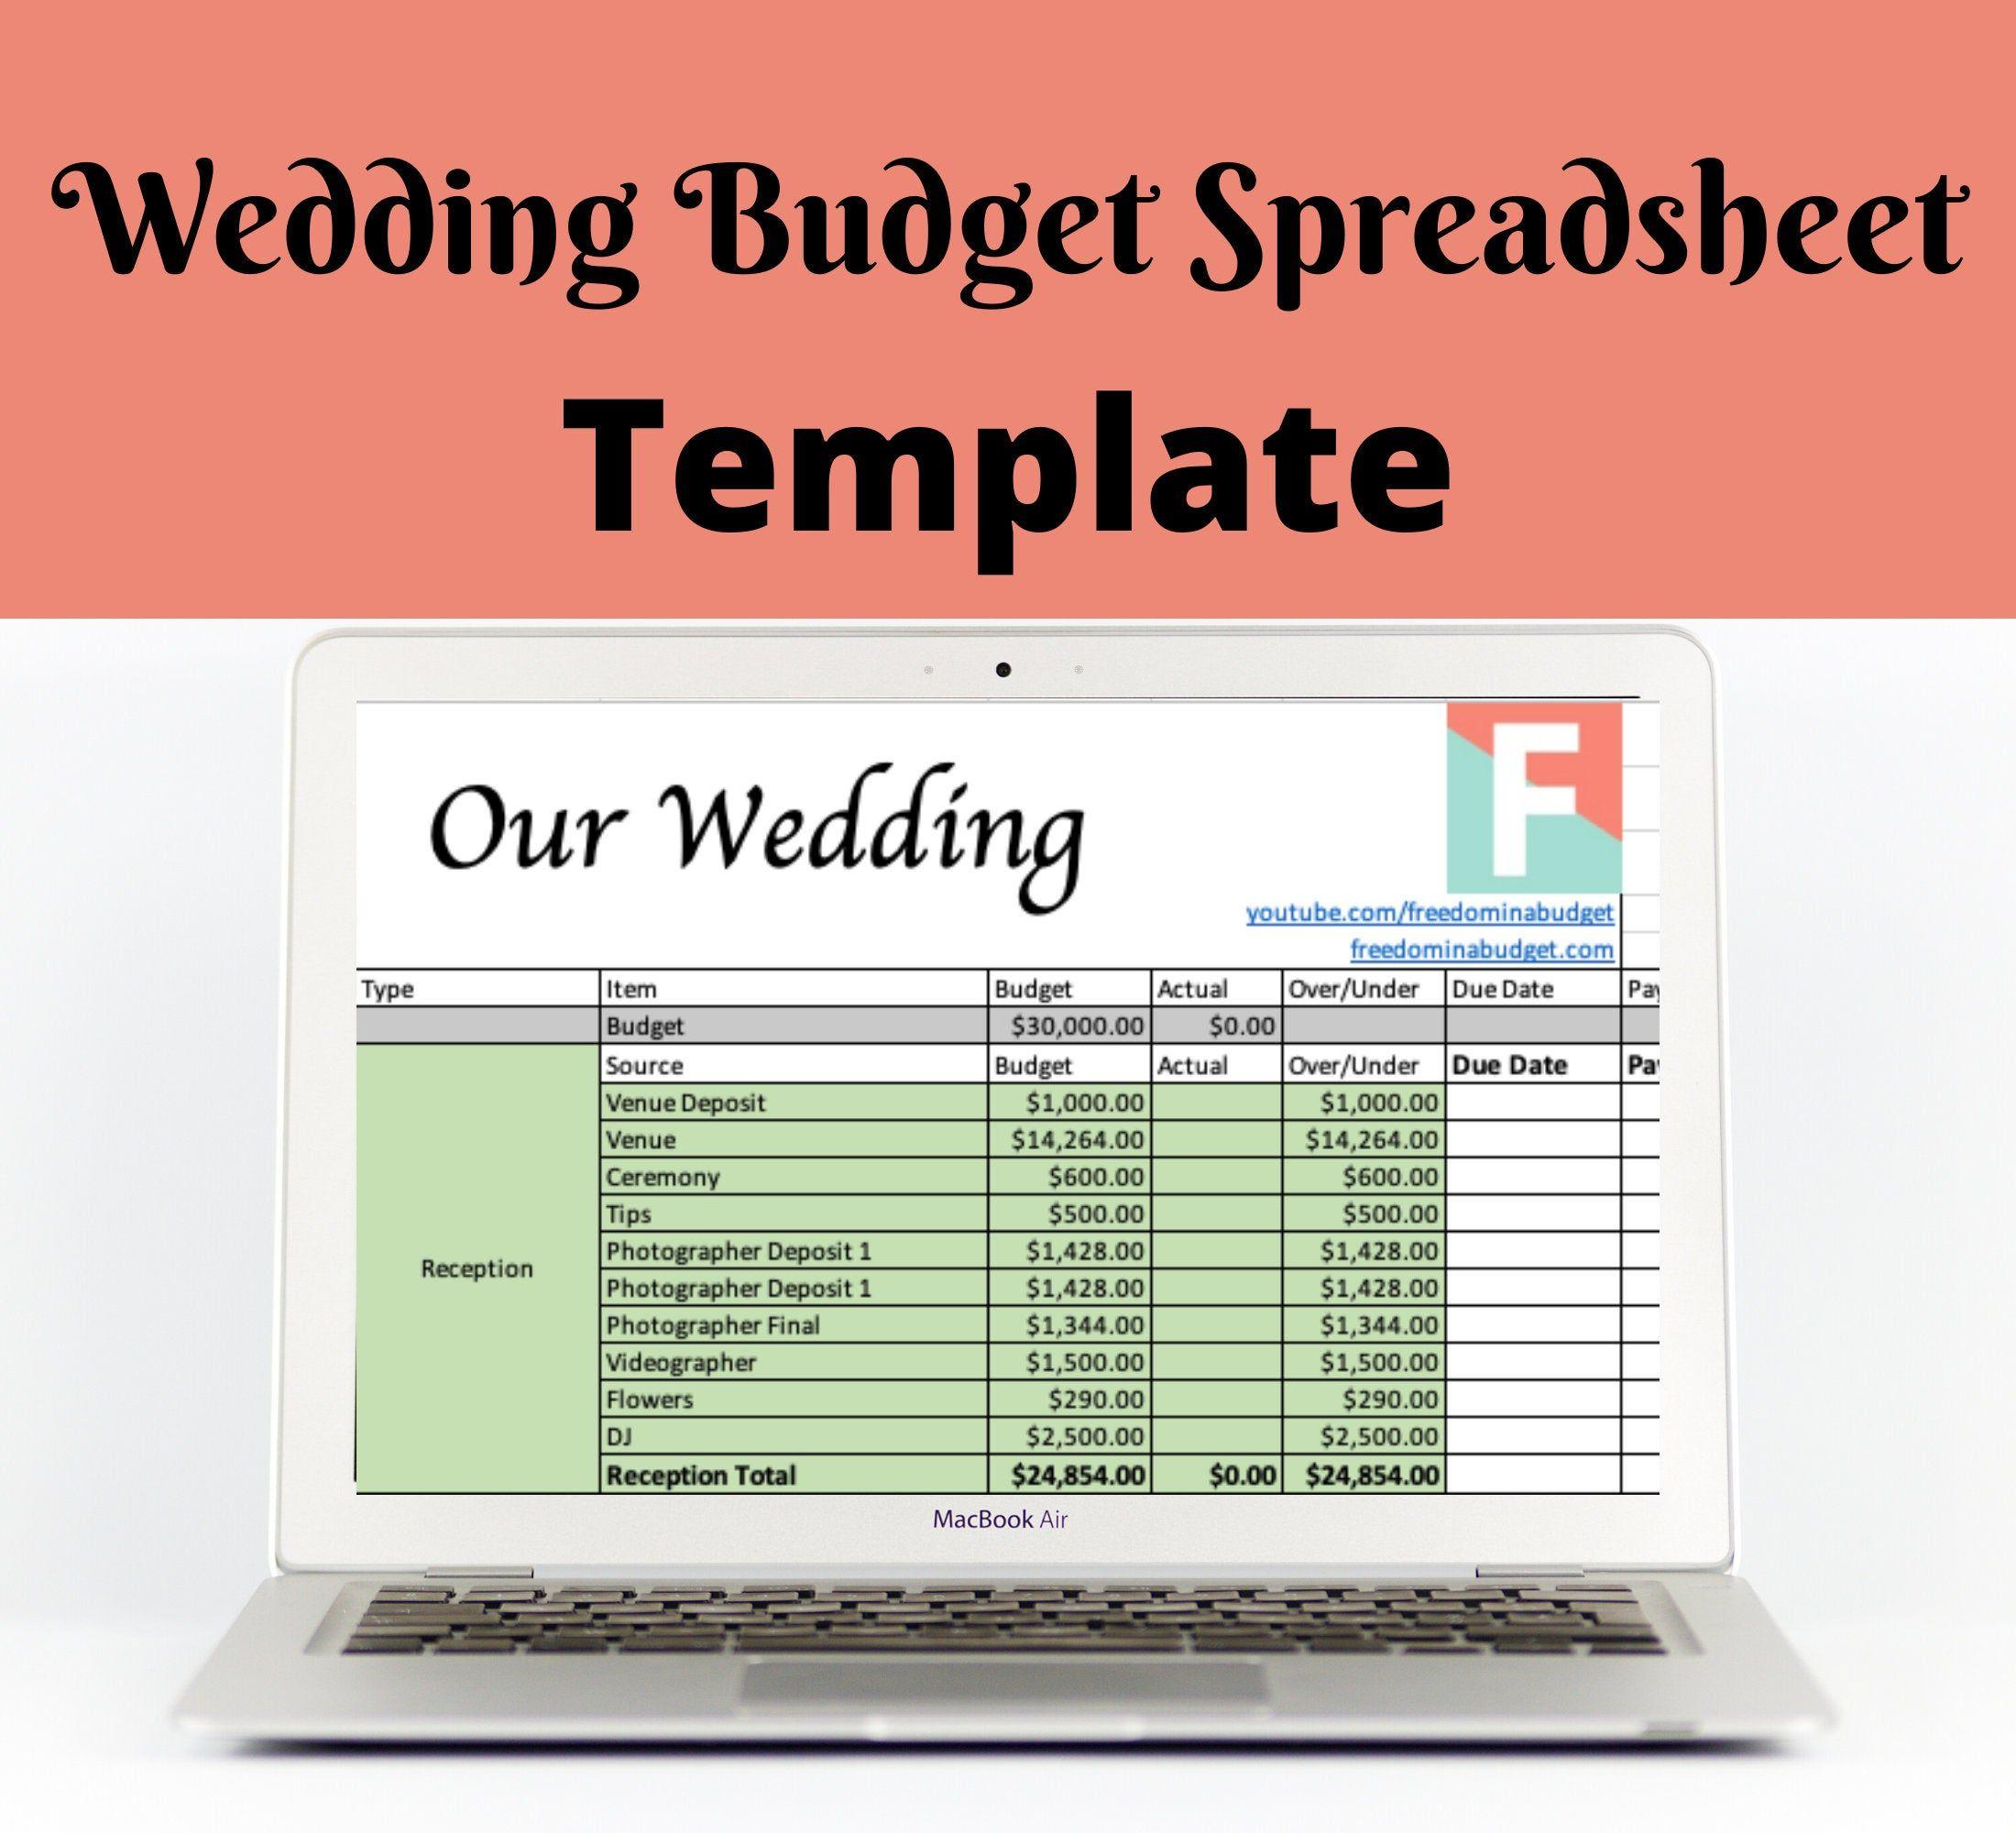 Wedding Budget Template Zero-Based Budget Excel Download ...